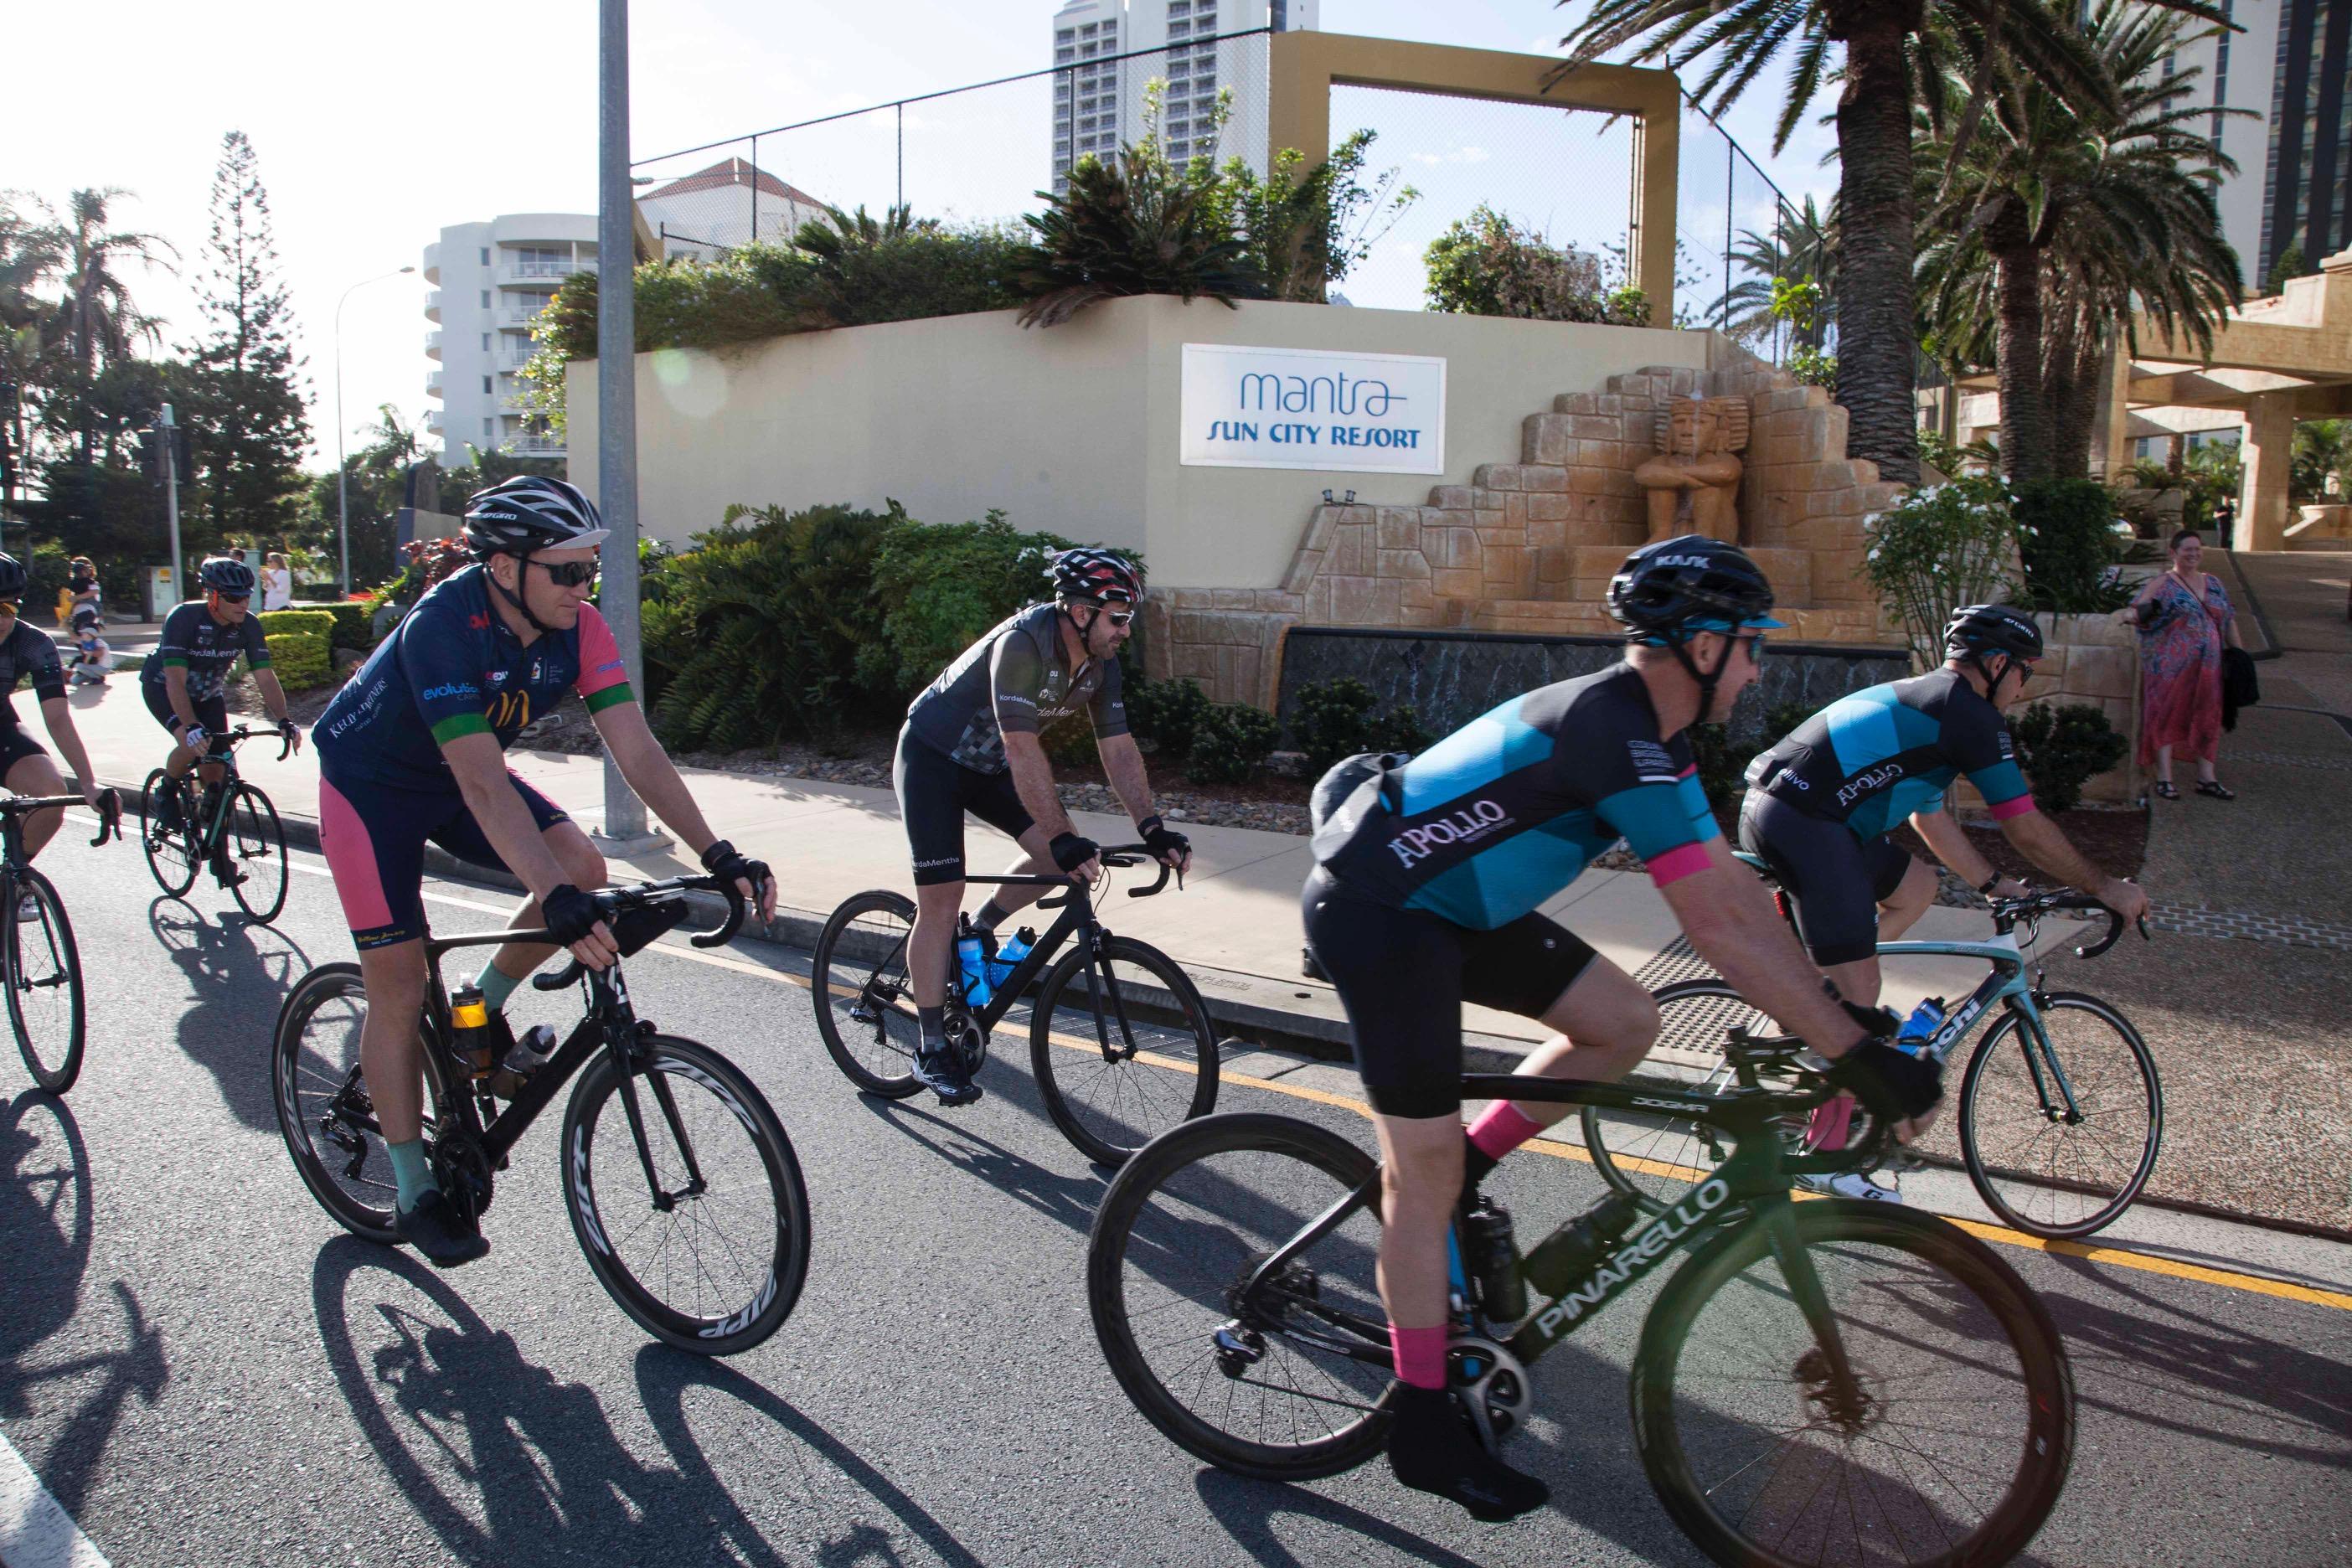 CyclistsarrivingatMantraSunCity